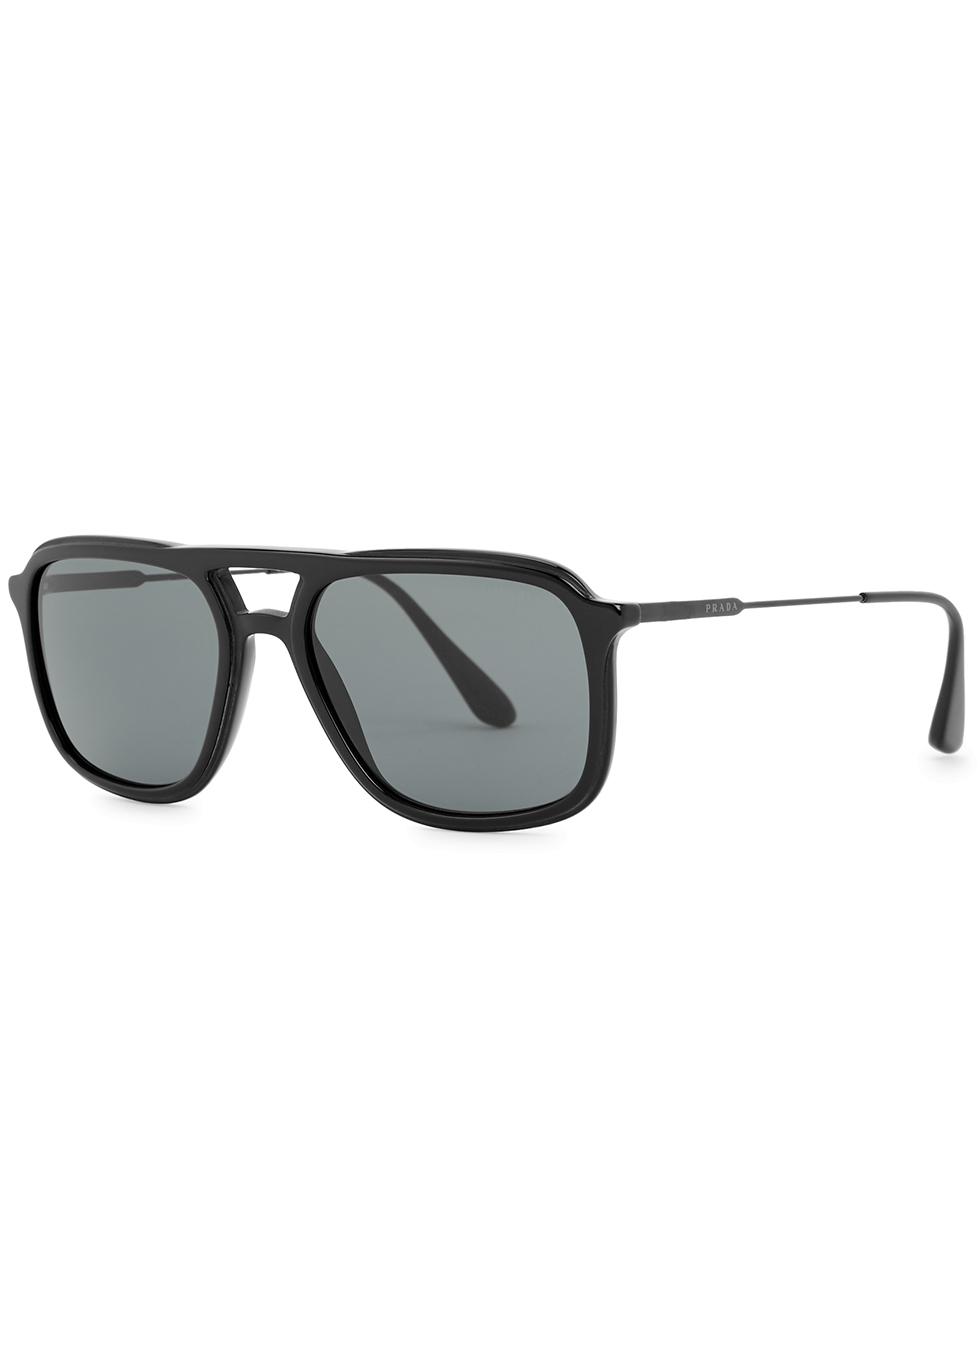 Black aviator-style sunglasses - Prada